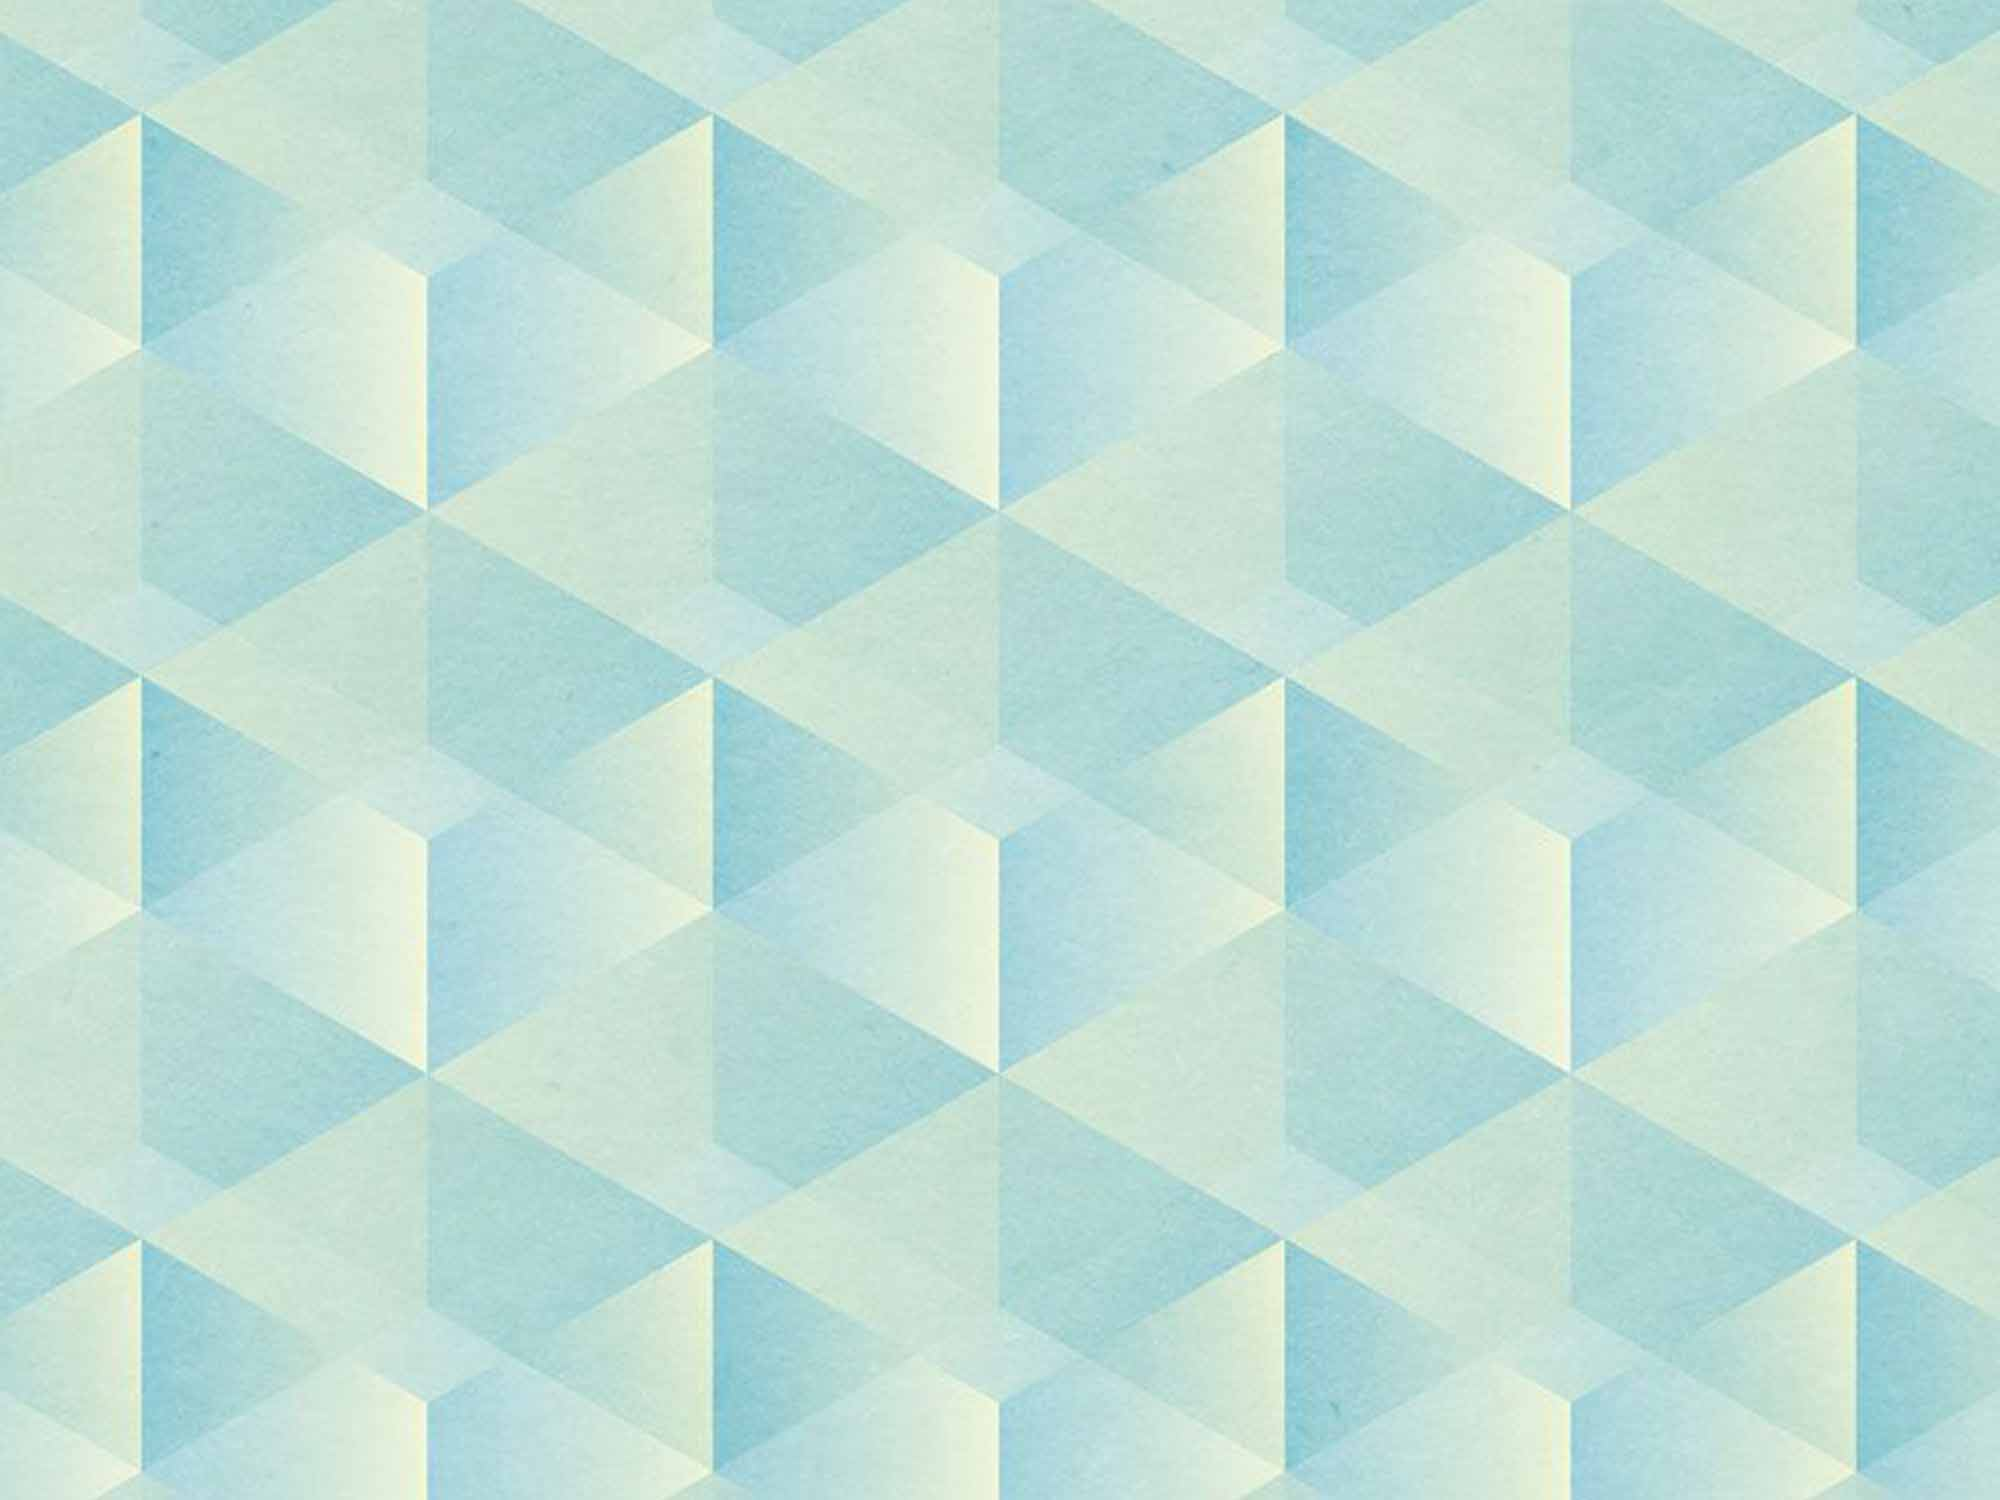 Papel de Parede para Sala Geométrico 0015 - Adesivos de Parede  - Paredes Decoradas